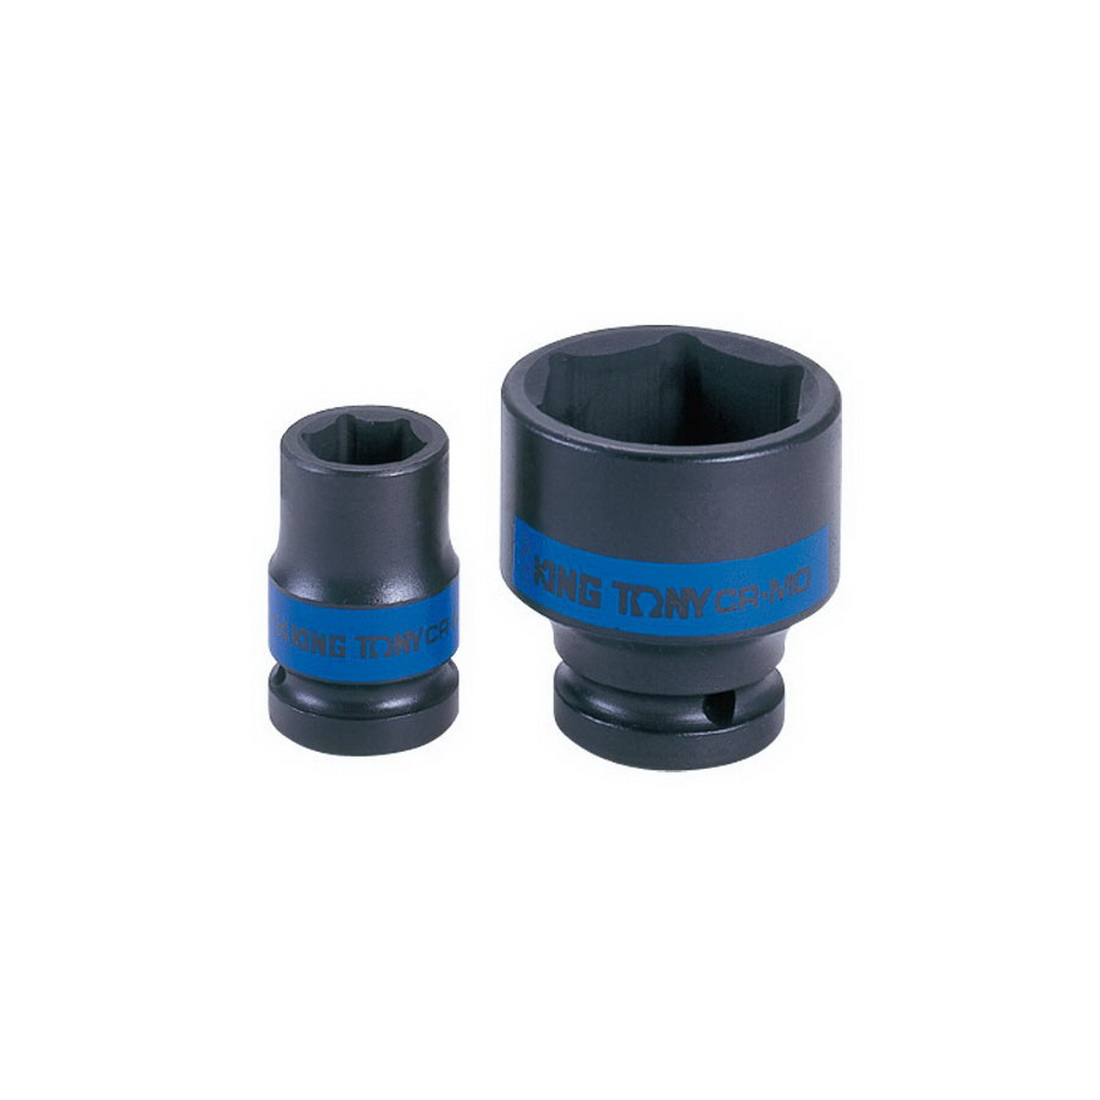 17mm 1/2 Inch Drive 6-Point Standard Impact Socket